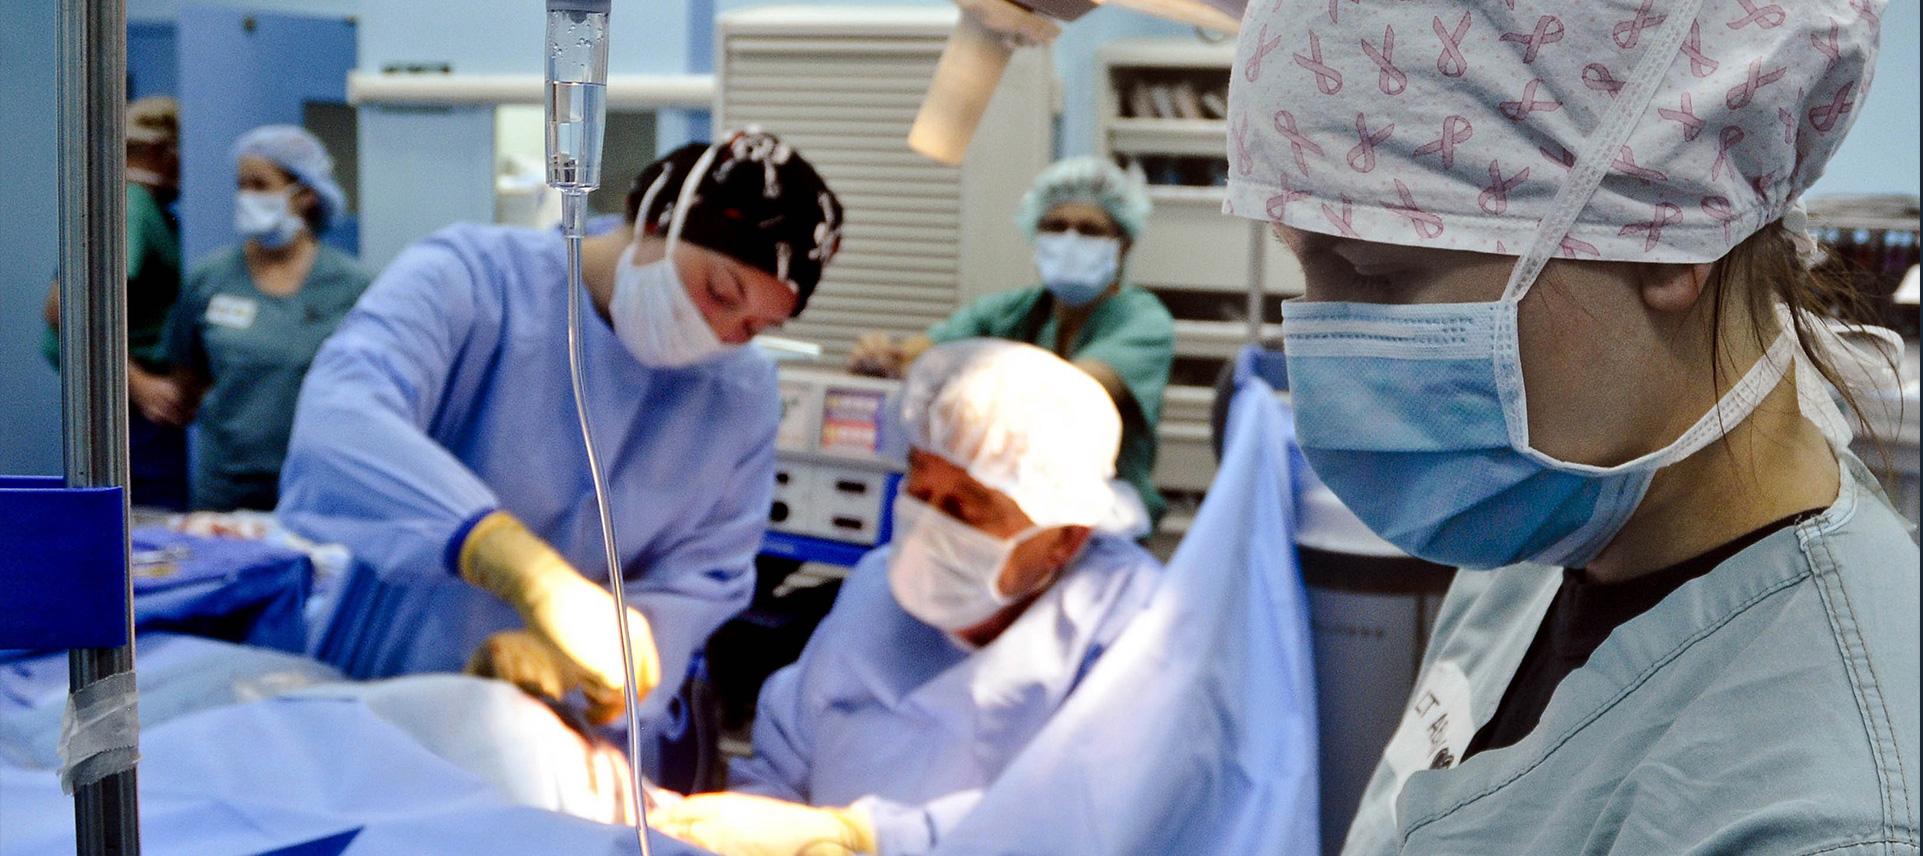 surgery-79584.jpg